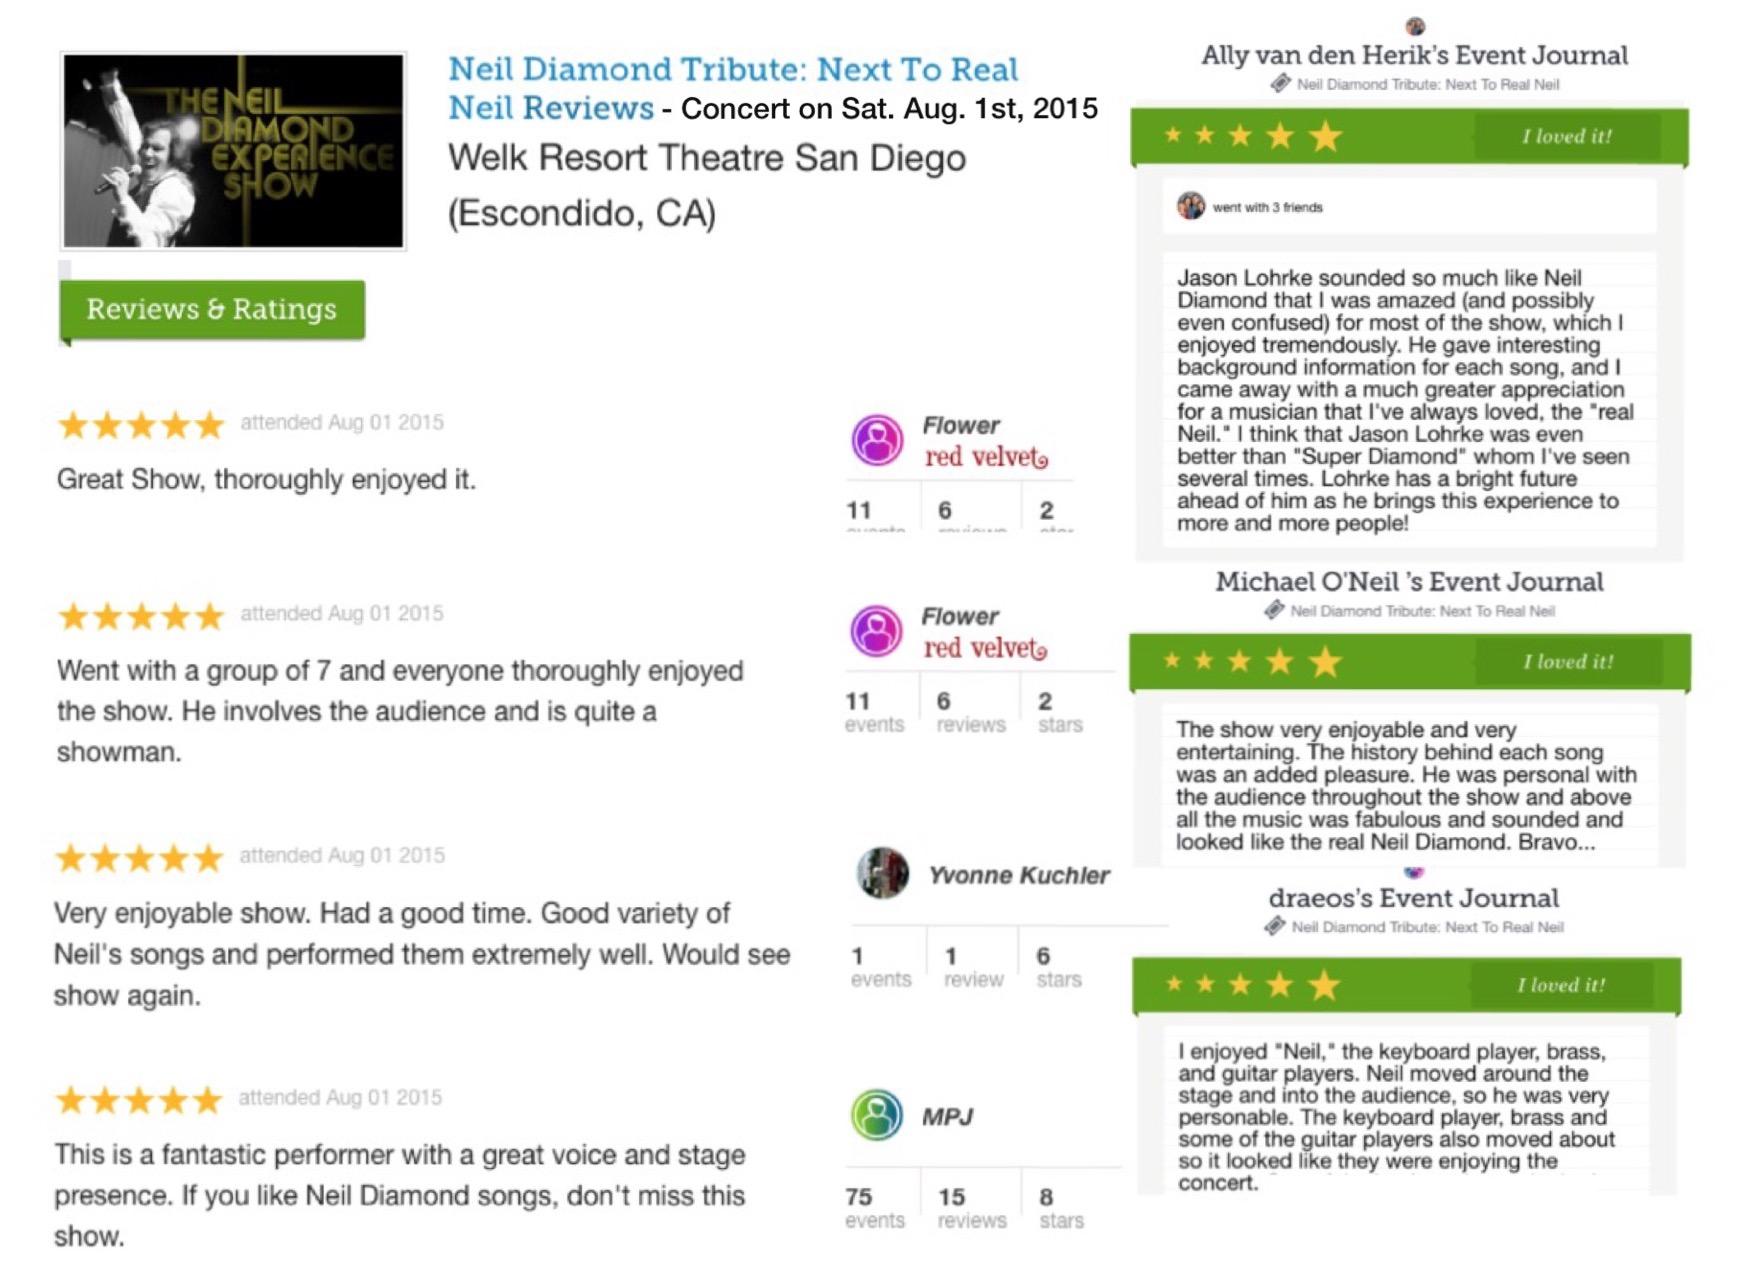 Neil Diamond Early Years Jason Lohrke Welk Theater Reviews Aug. 1 2015